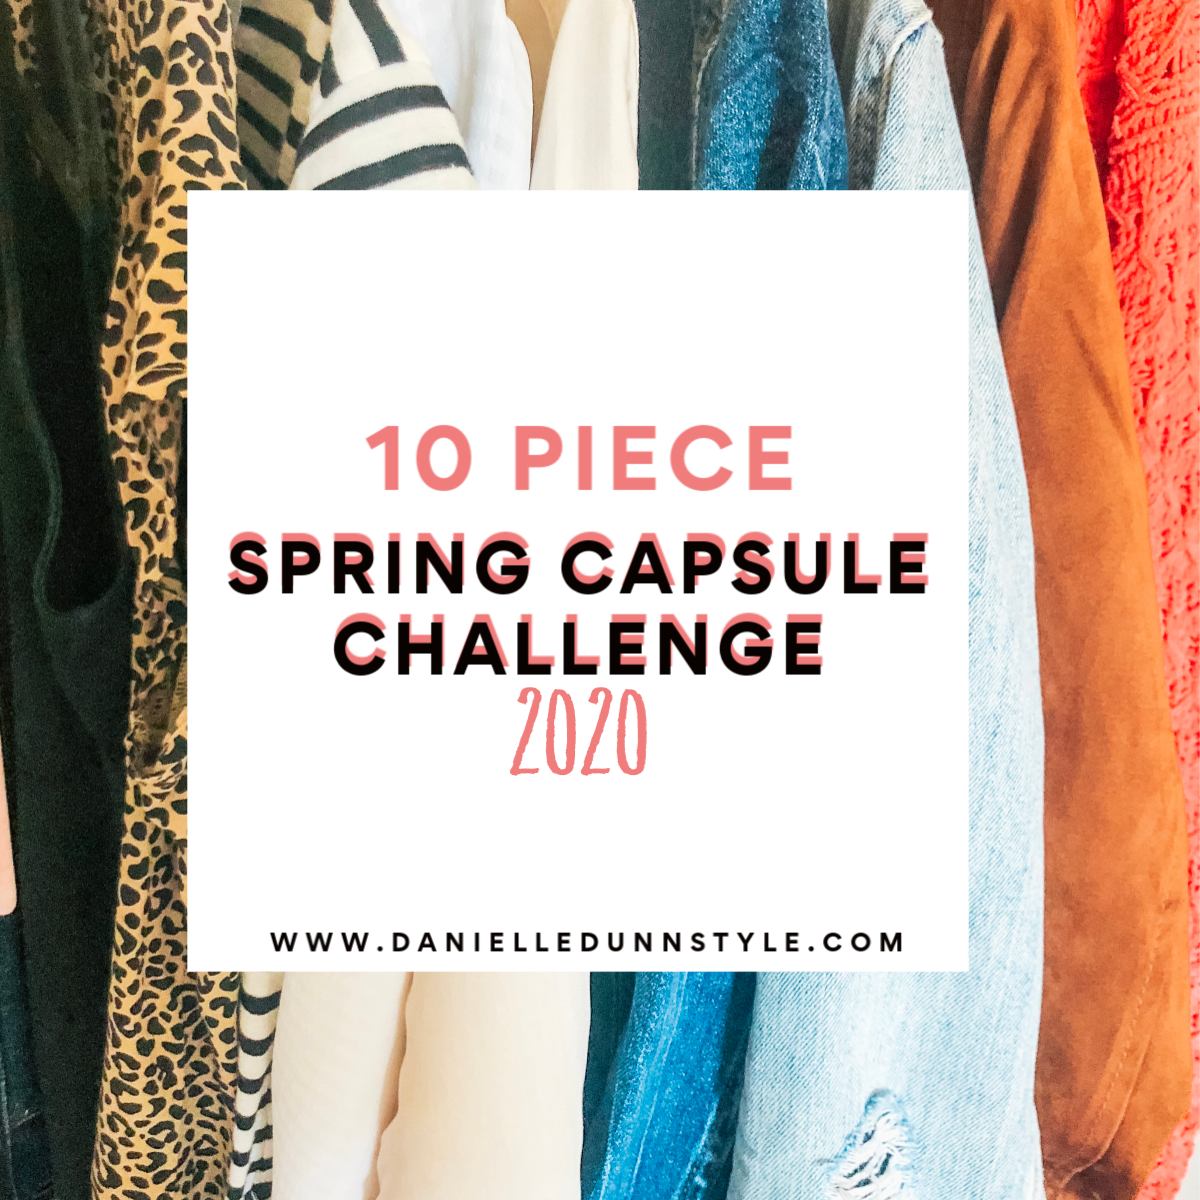 10 PIECE SPRING CAPSULE CHALLENGE